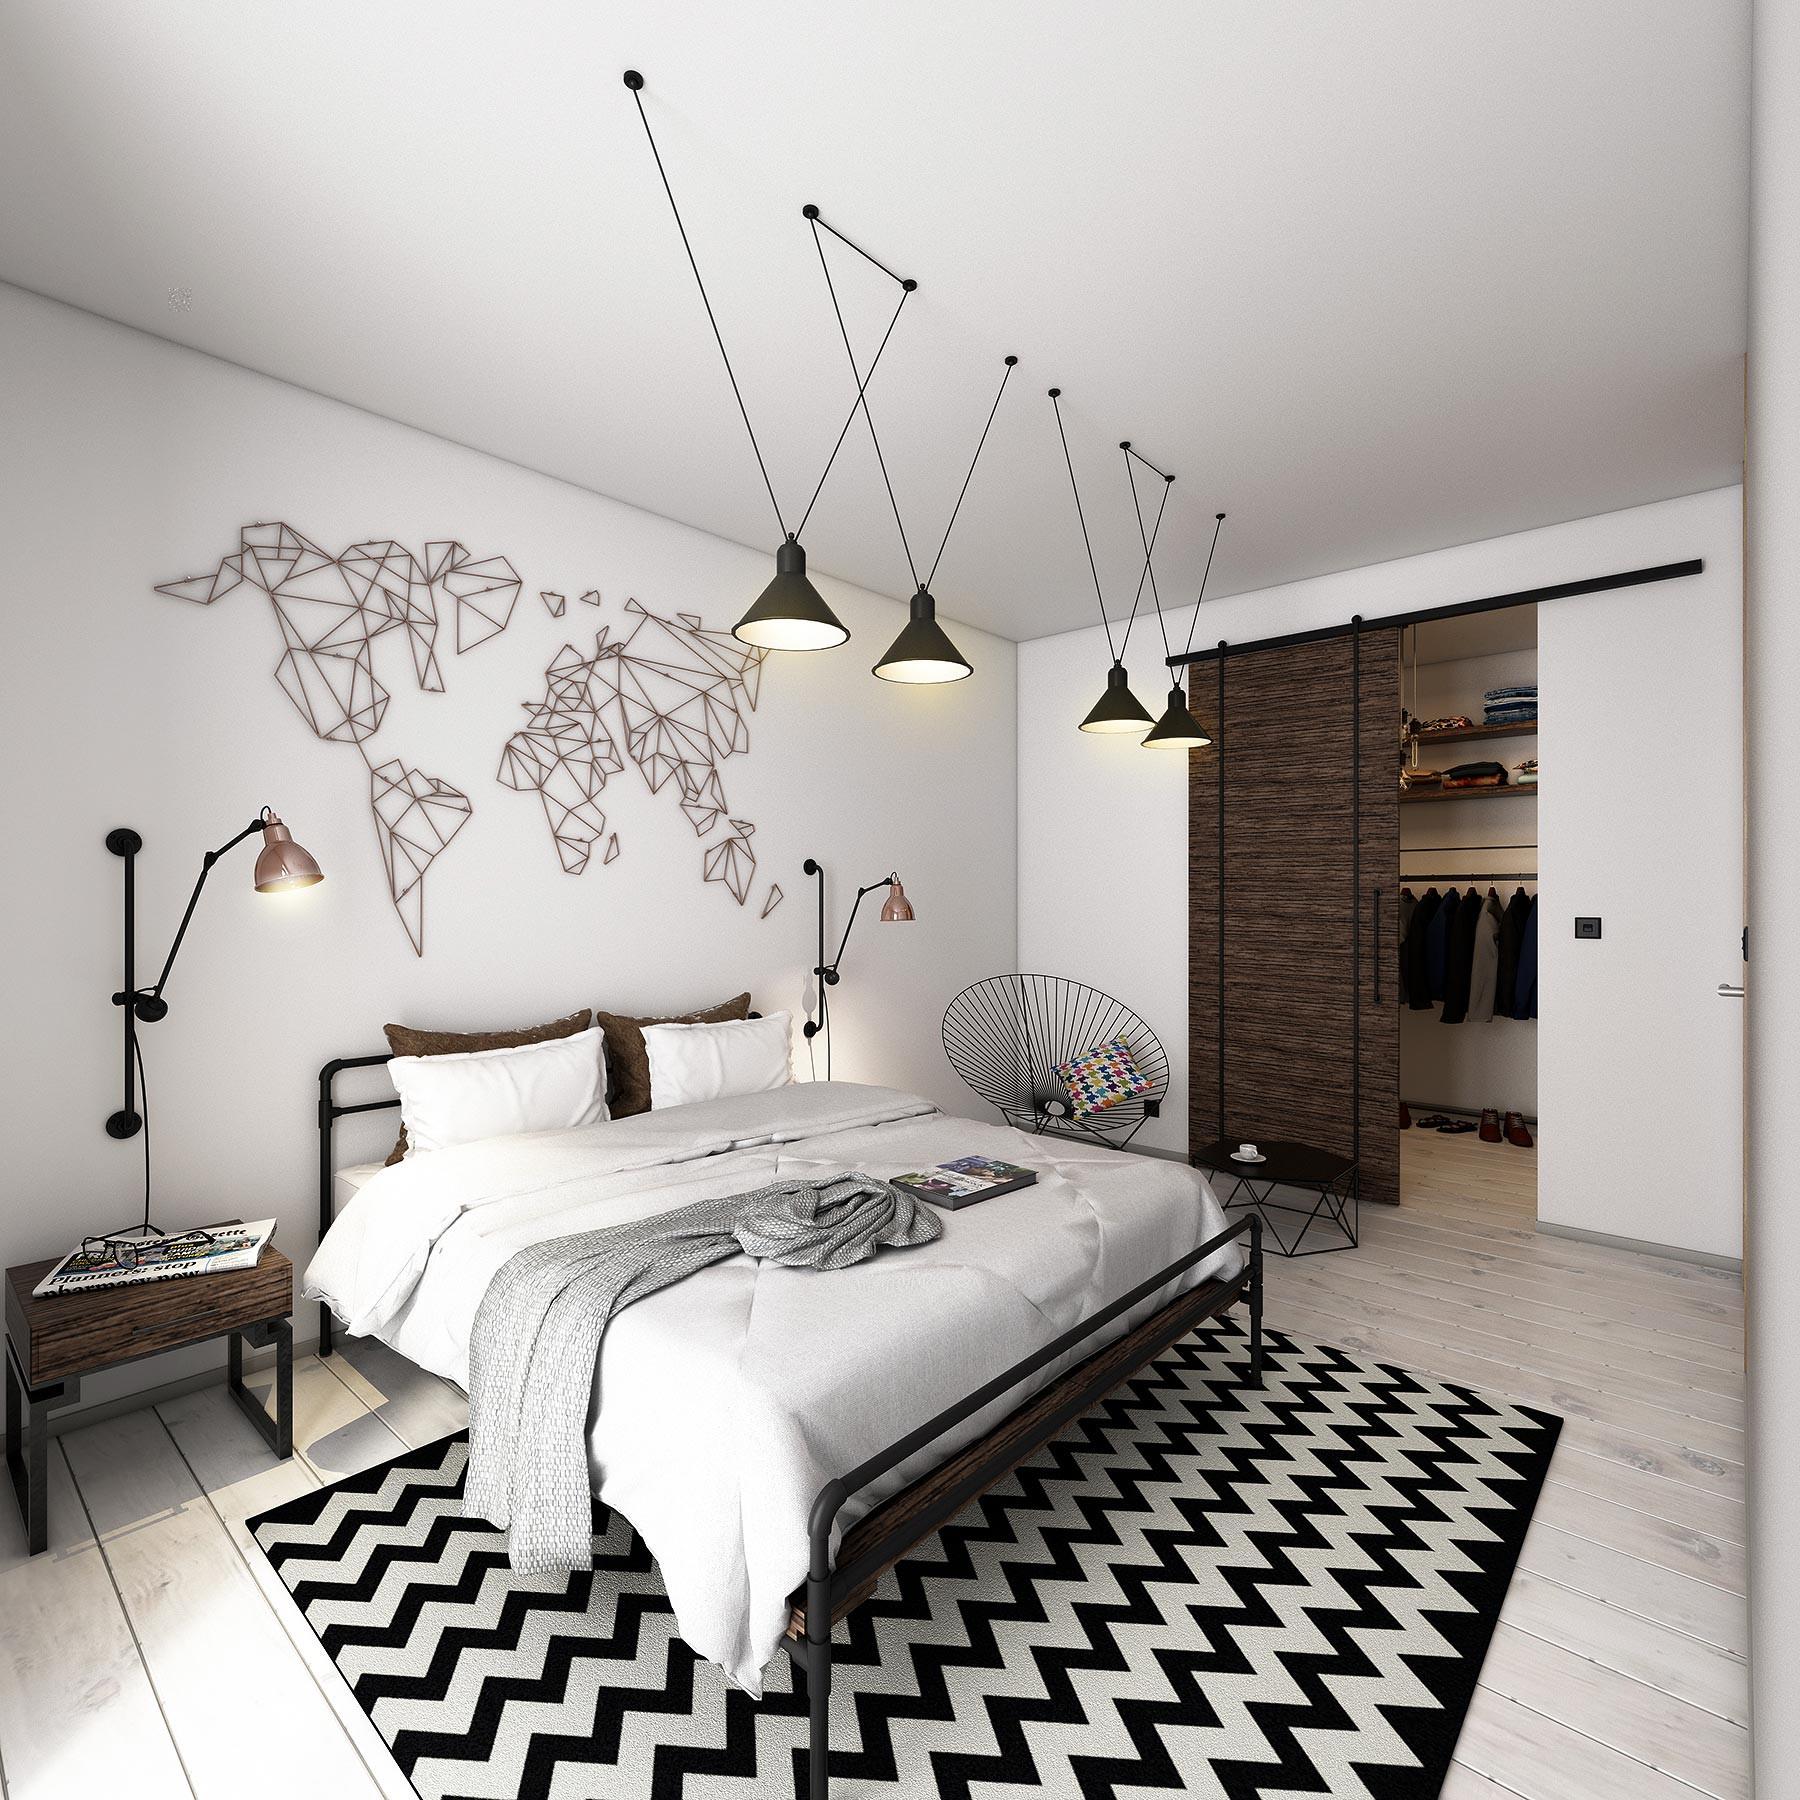 jednopodlazni_moderni_rodinny_dum_se_sikmou_strechou_dream_homes_plavec_loznice